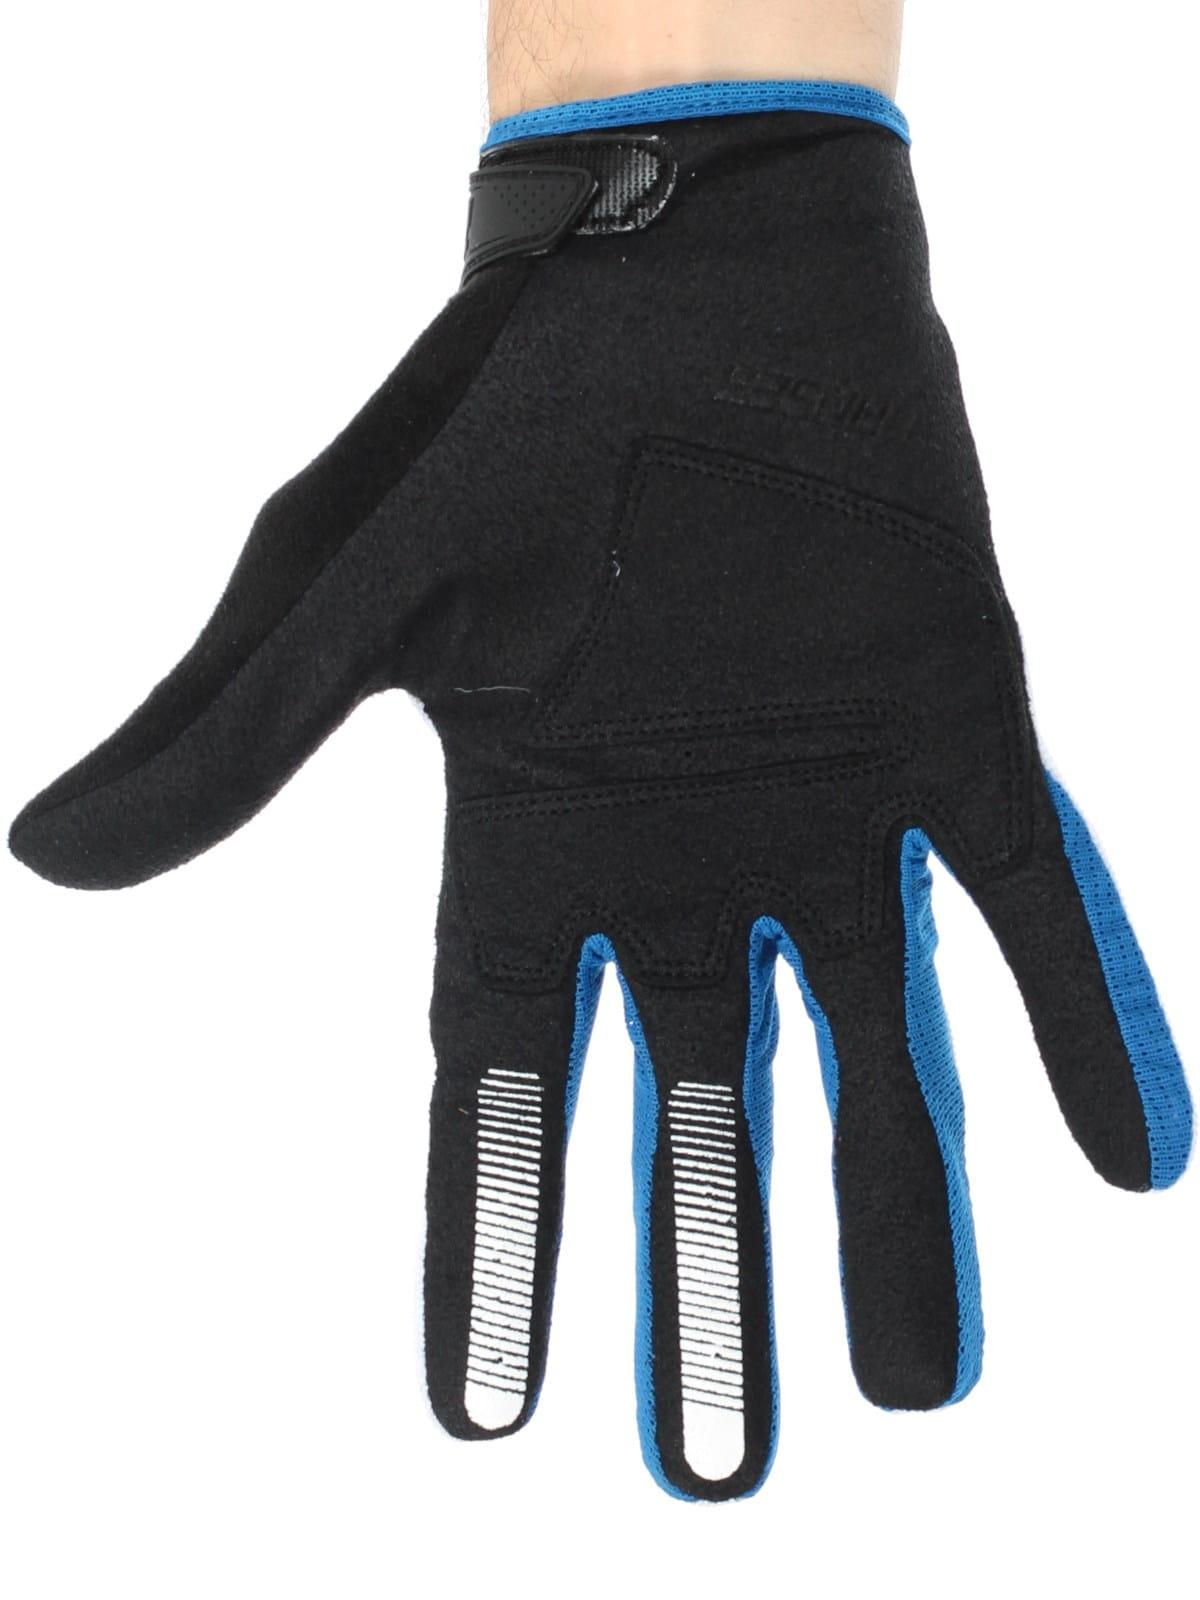 Fox Racing 2015 Giant Ranger Glove Blue